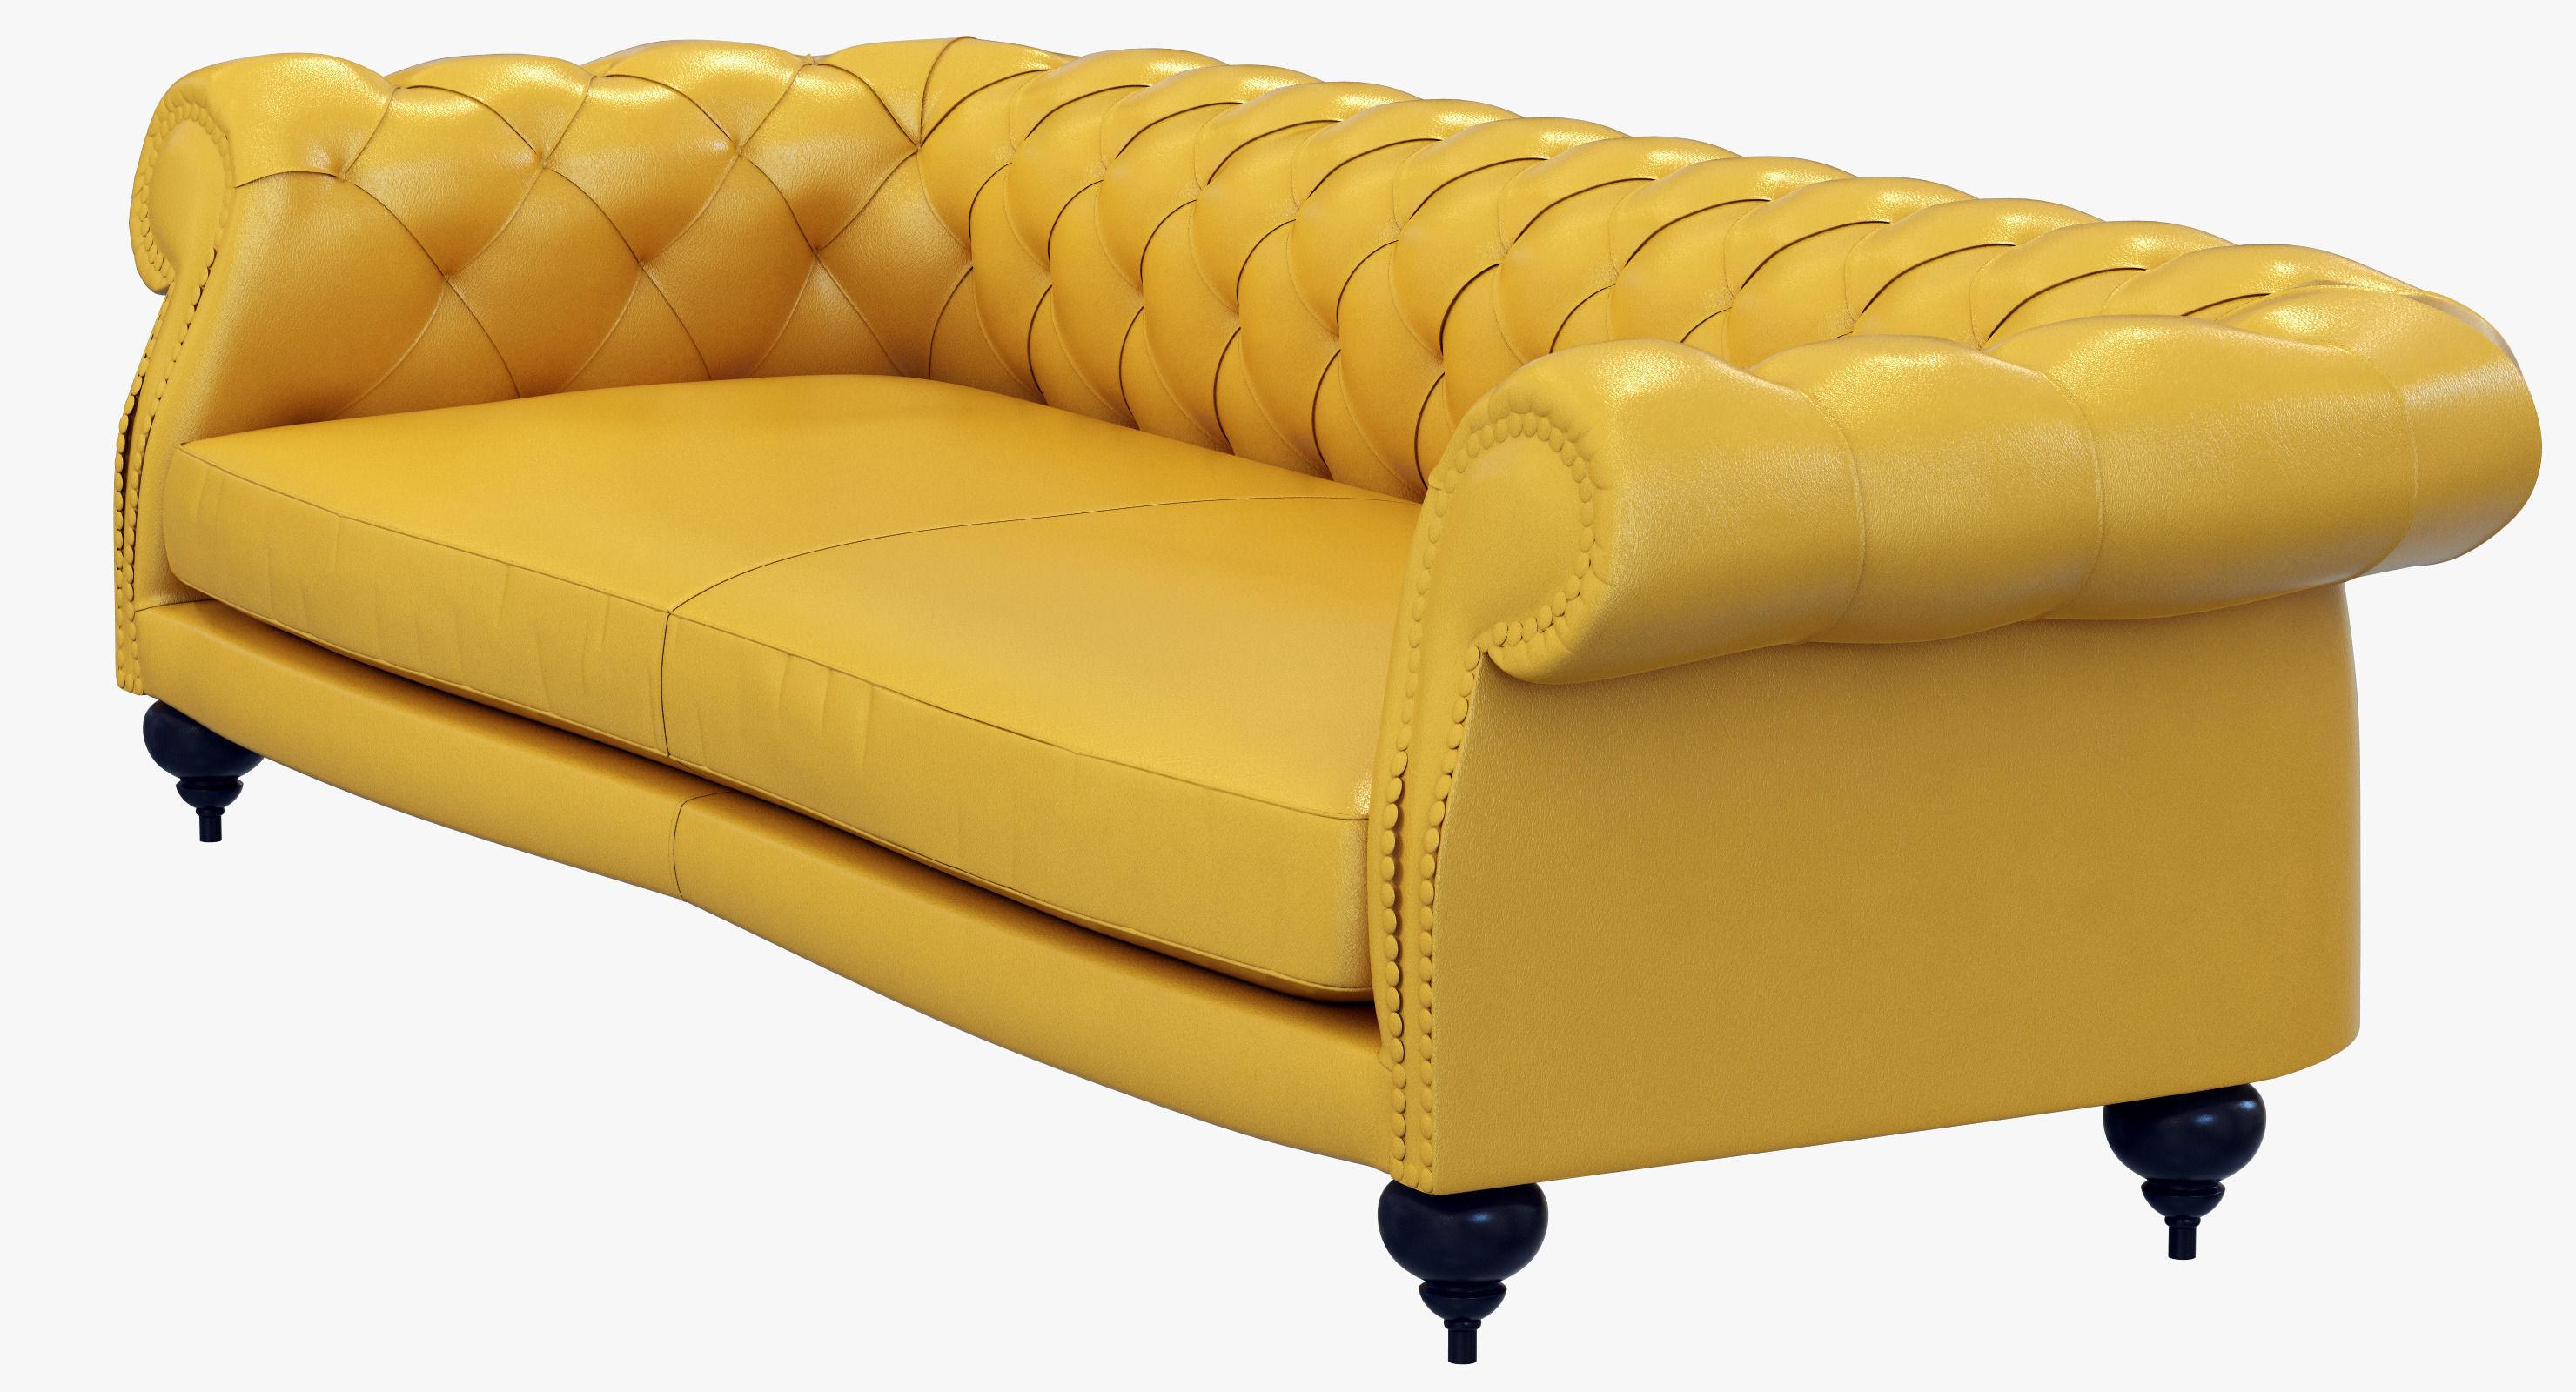 baxter sofa ashley levon set diana chester 3d model max cgtrader